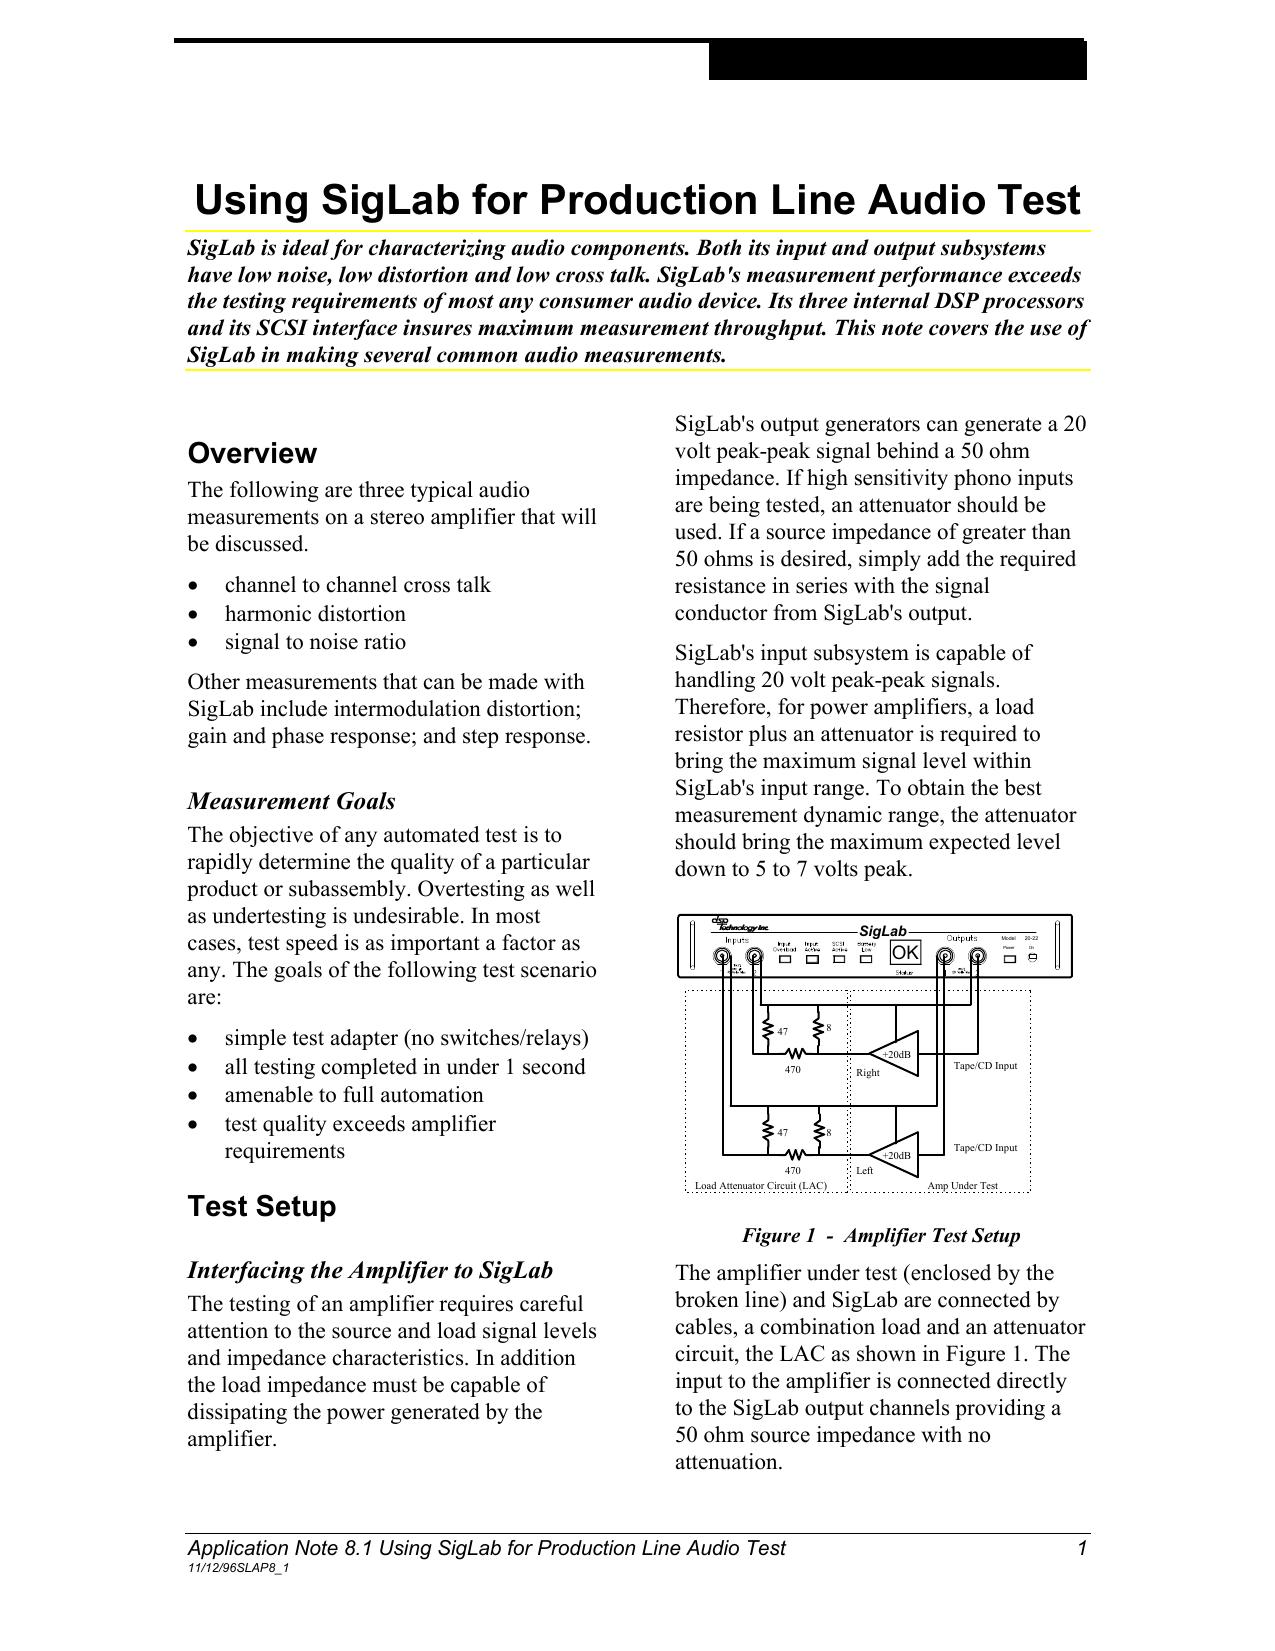 Using SigLab for Production Line Audio Test | manualzz com